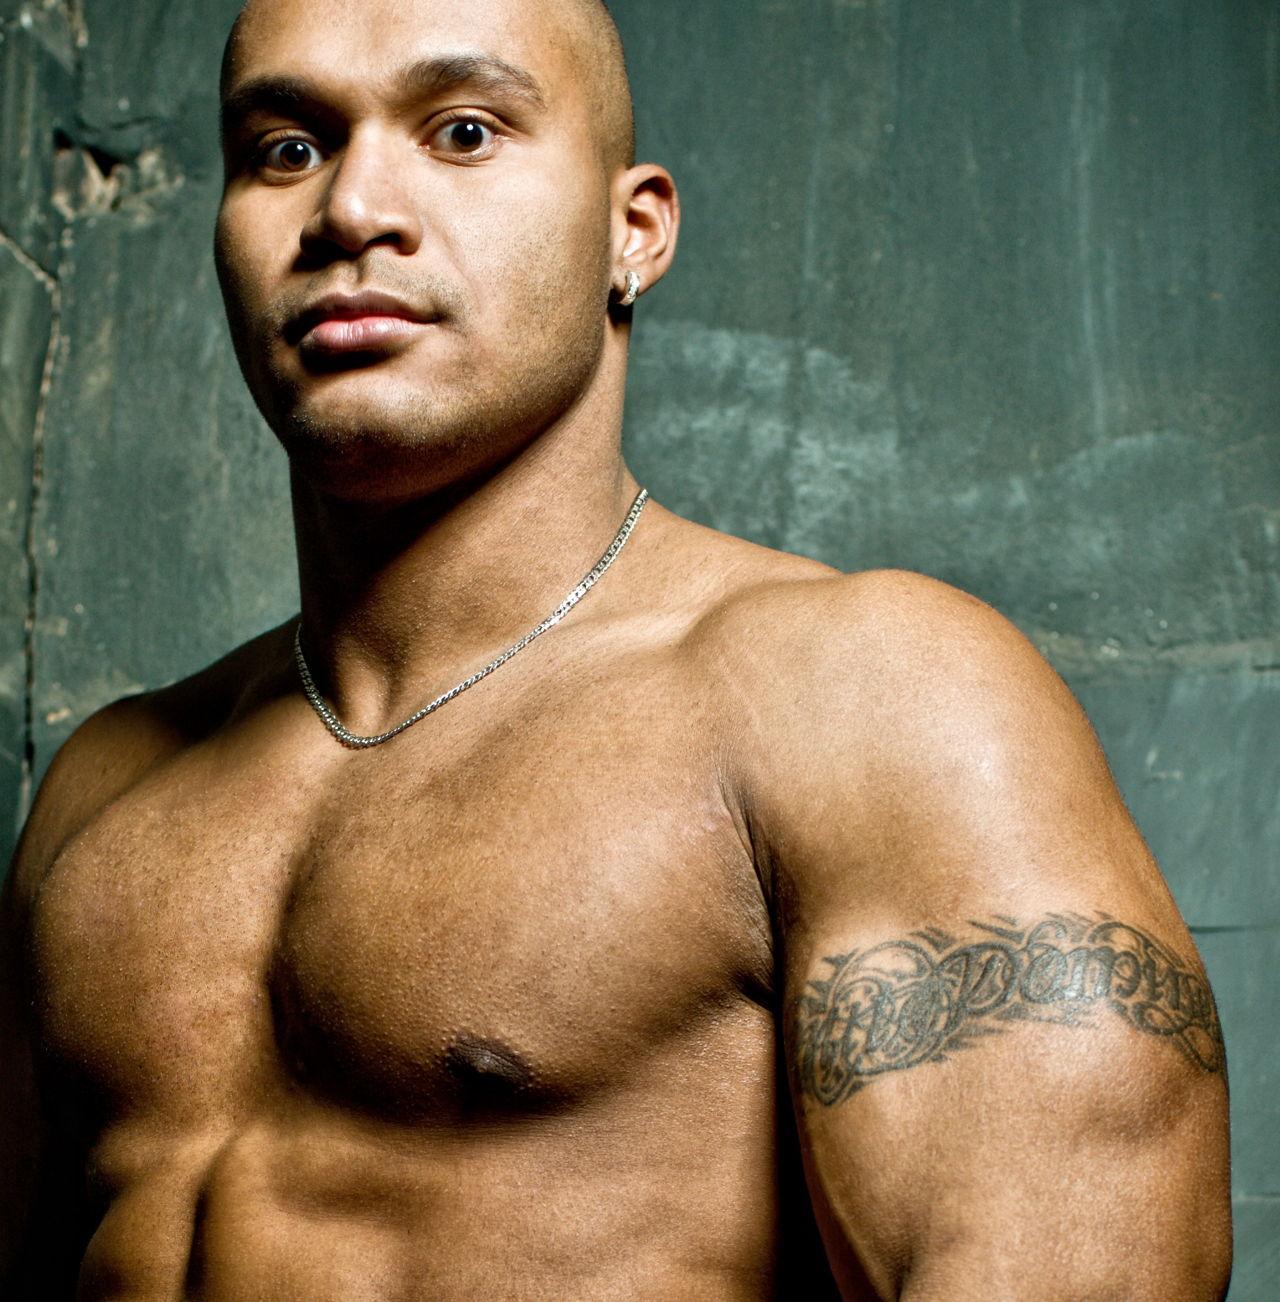 tattoo half designs sleeve young portrait tattoos